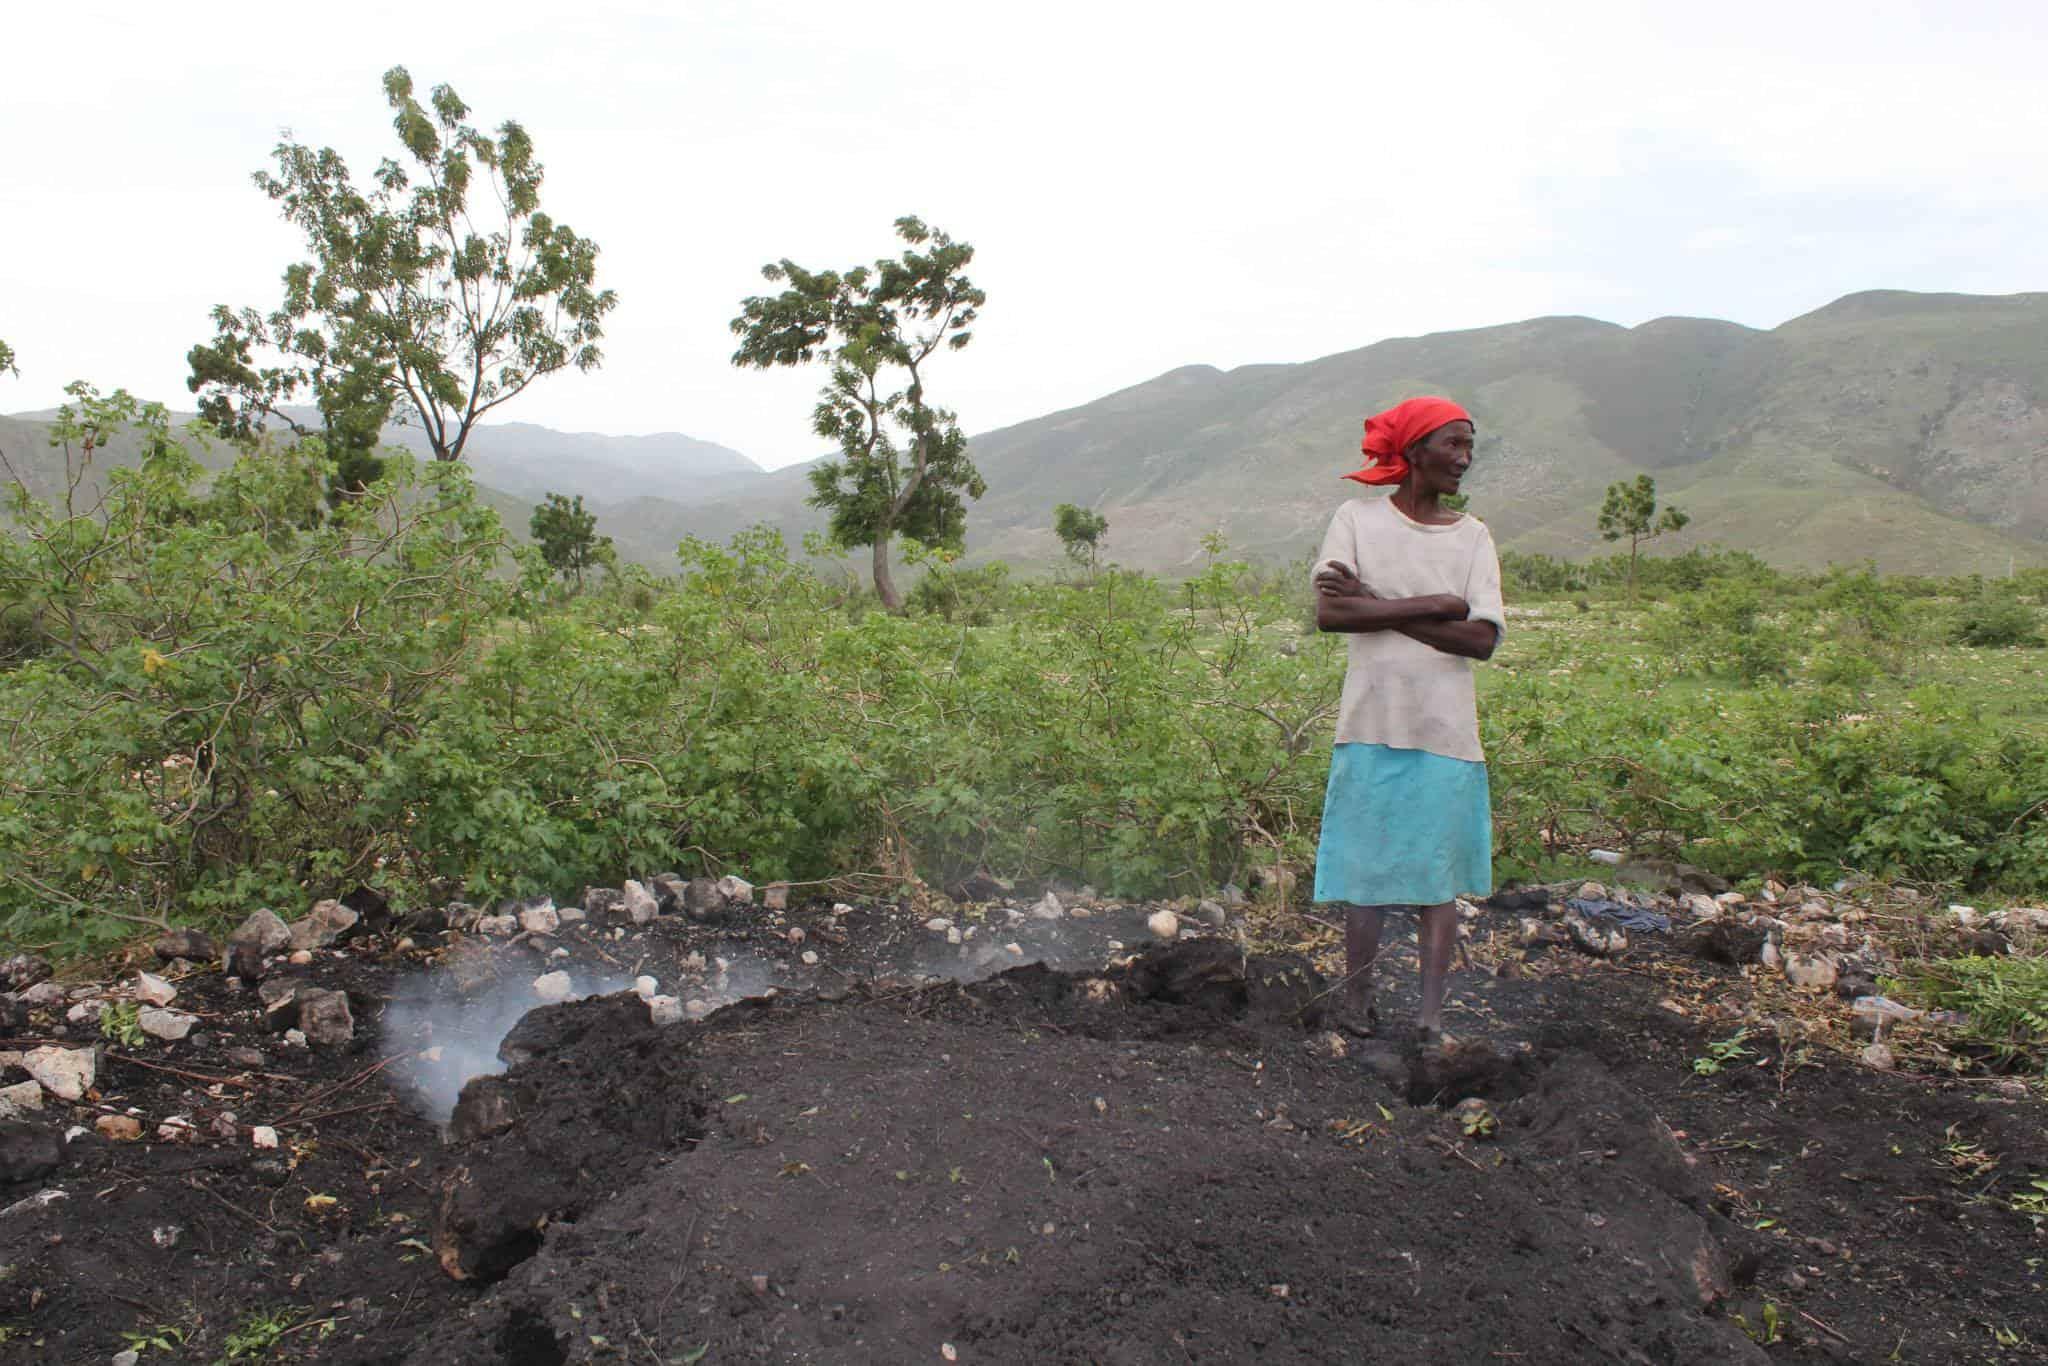 Lady-Haiti-Charcoal